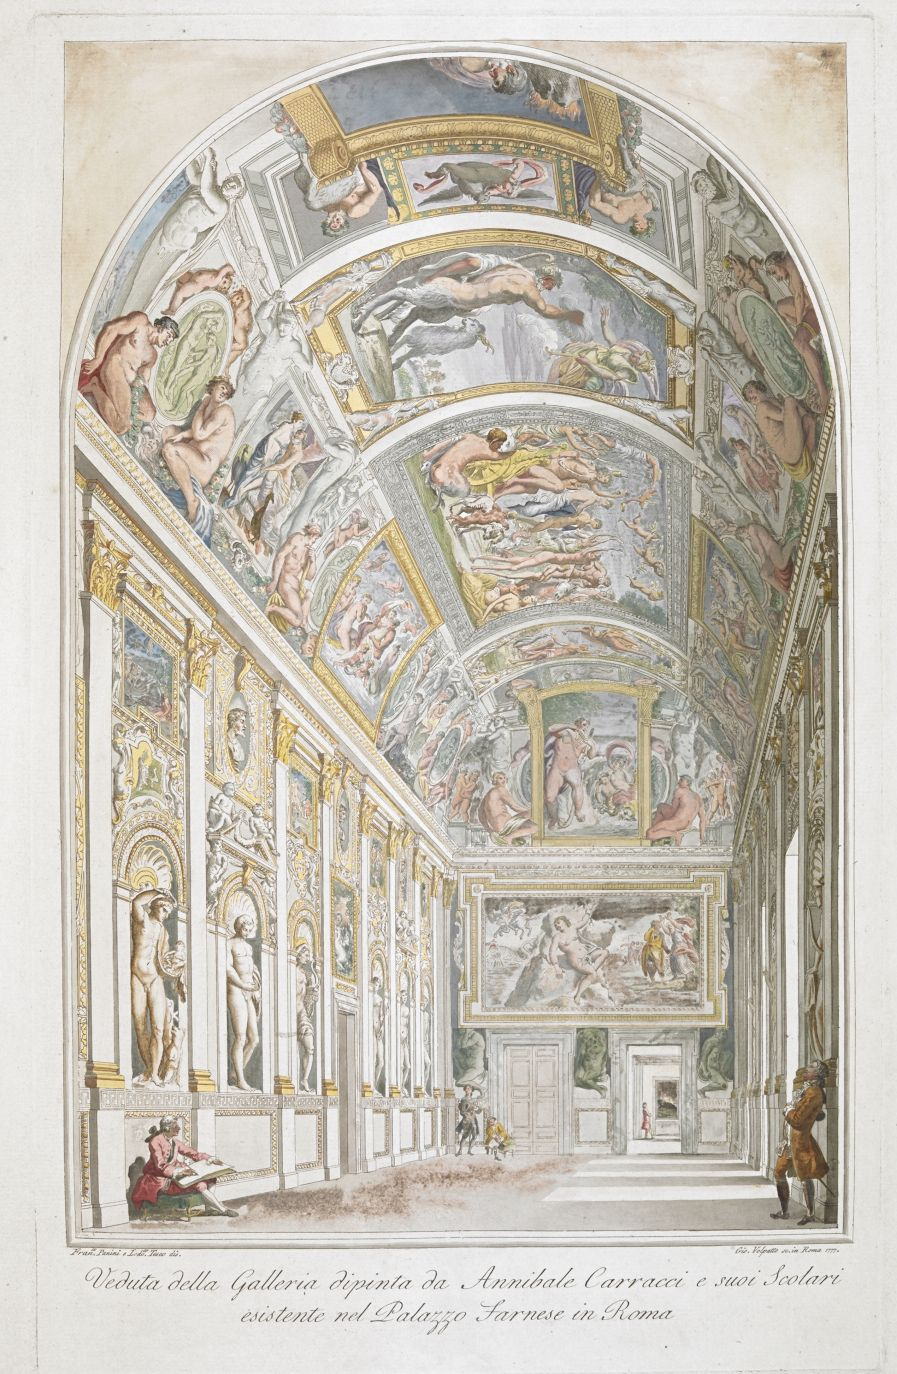 A view of Annibale Carracci's fresco gallery in the Palazzo Farnese, Rome